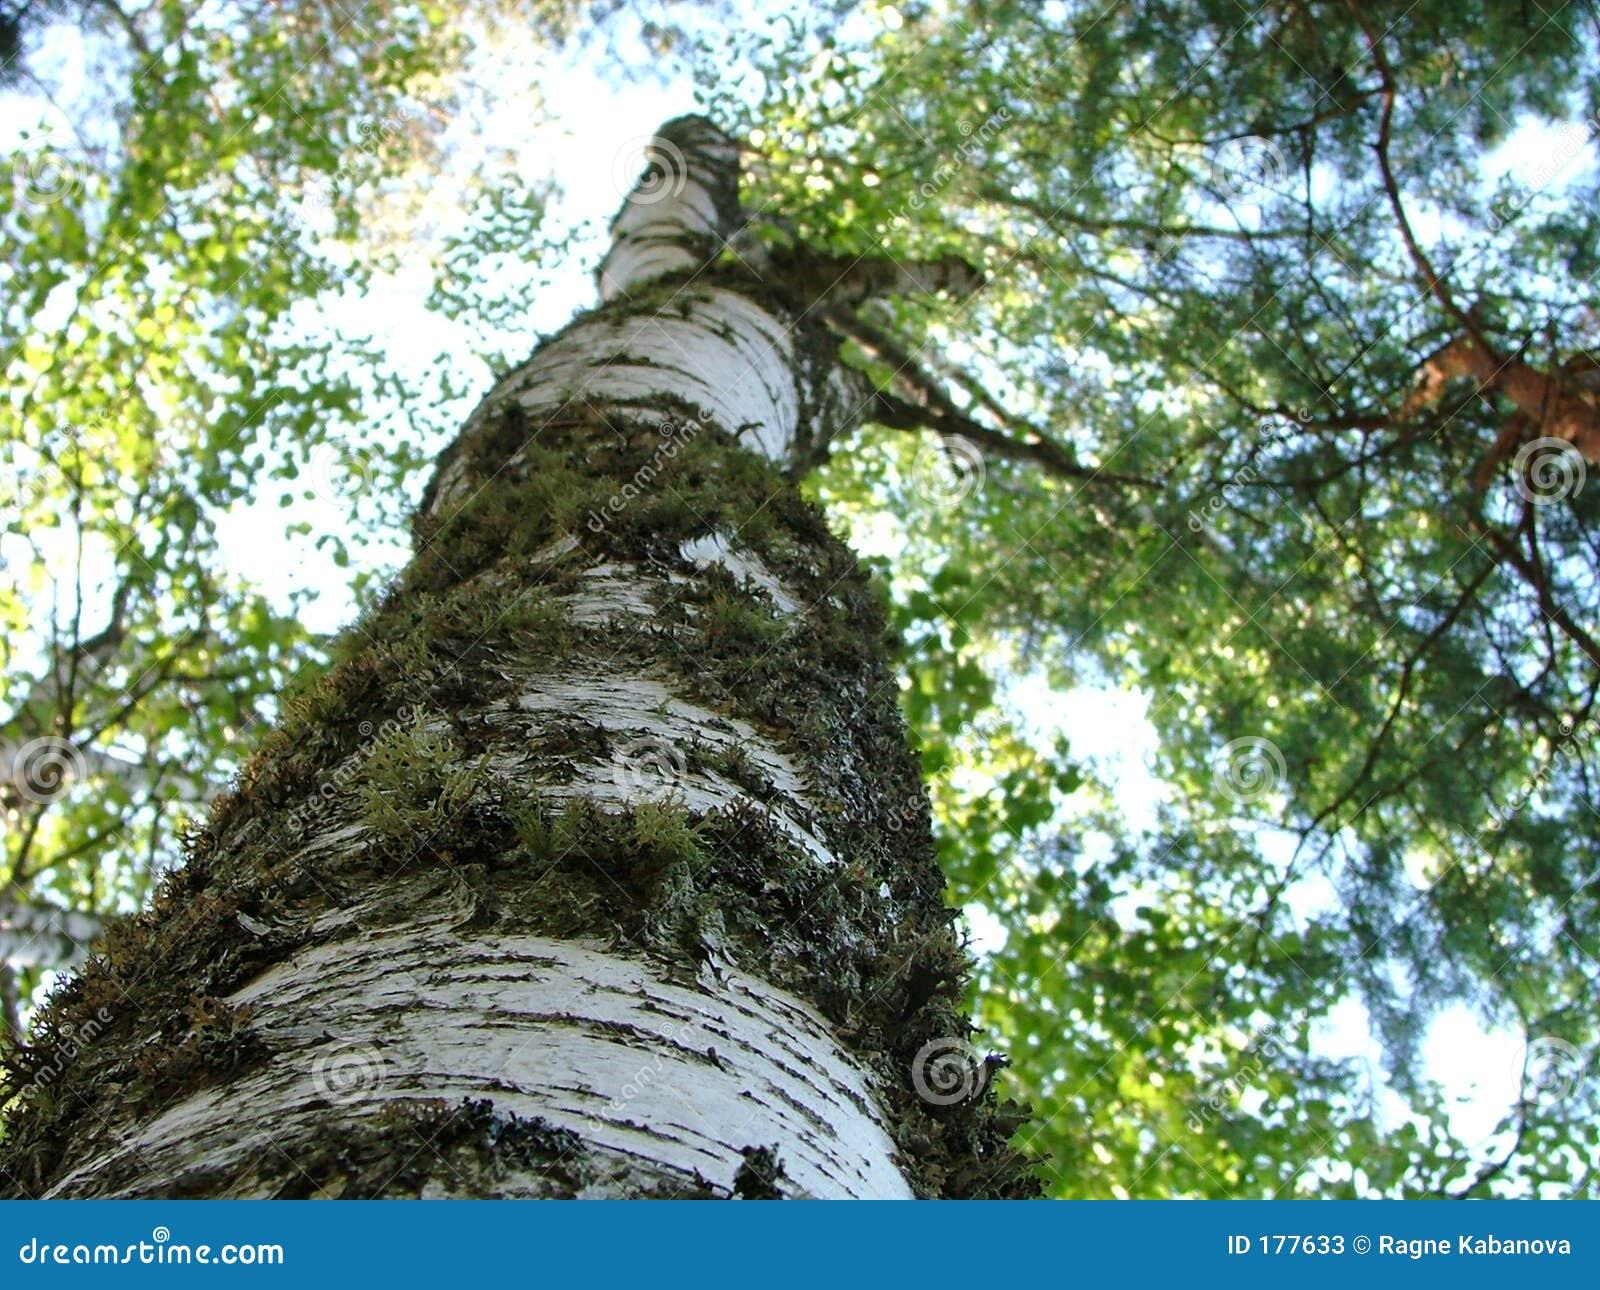 bole of a birch tree close up stock image image 177633. Black Bedroom Furniture Sets. Home Design Ideas